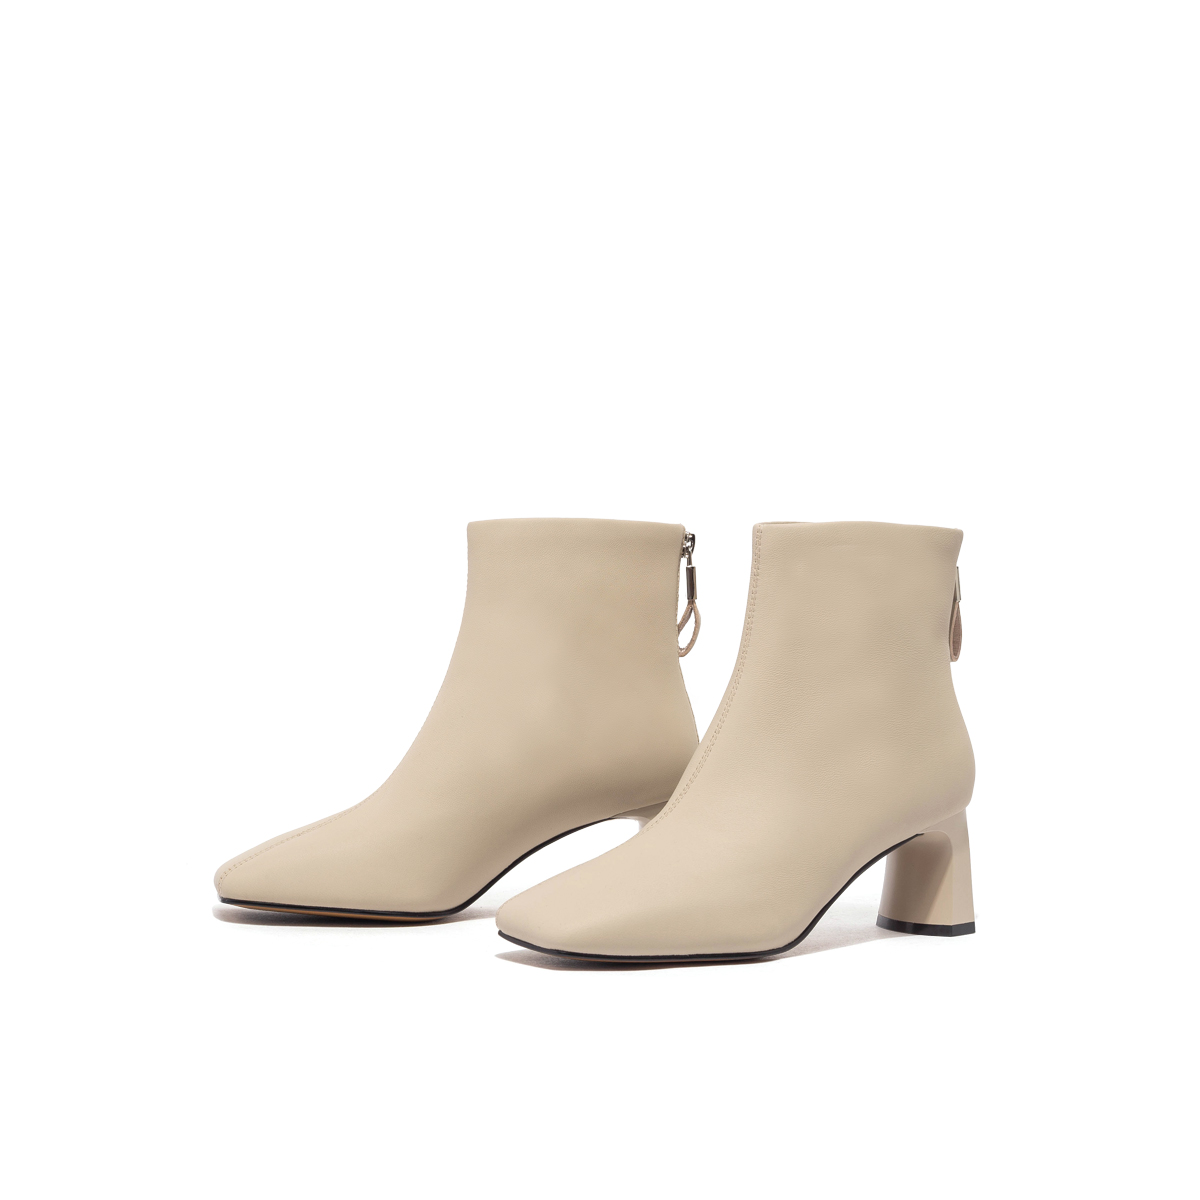 SS04116842 中跟短筒靴后拉链时装靴瘦瘦靴 2020 星期六靴子冬季新款